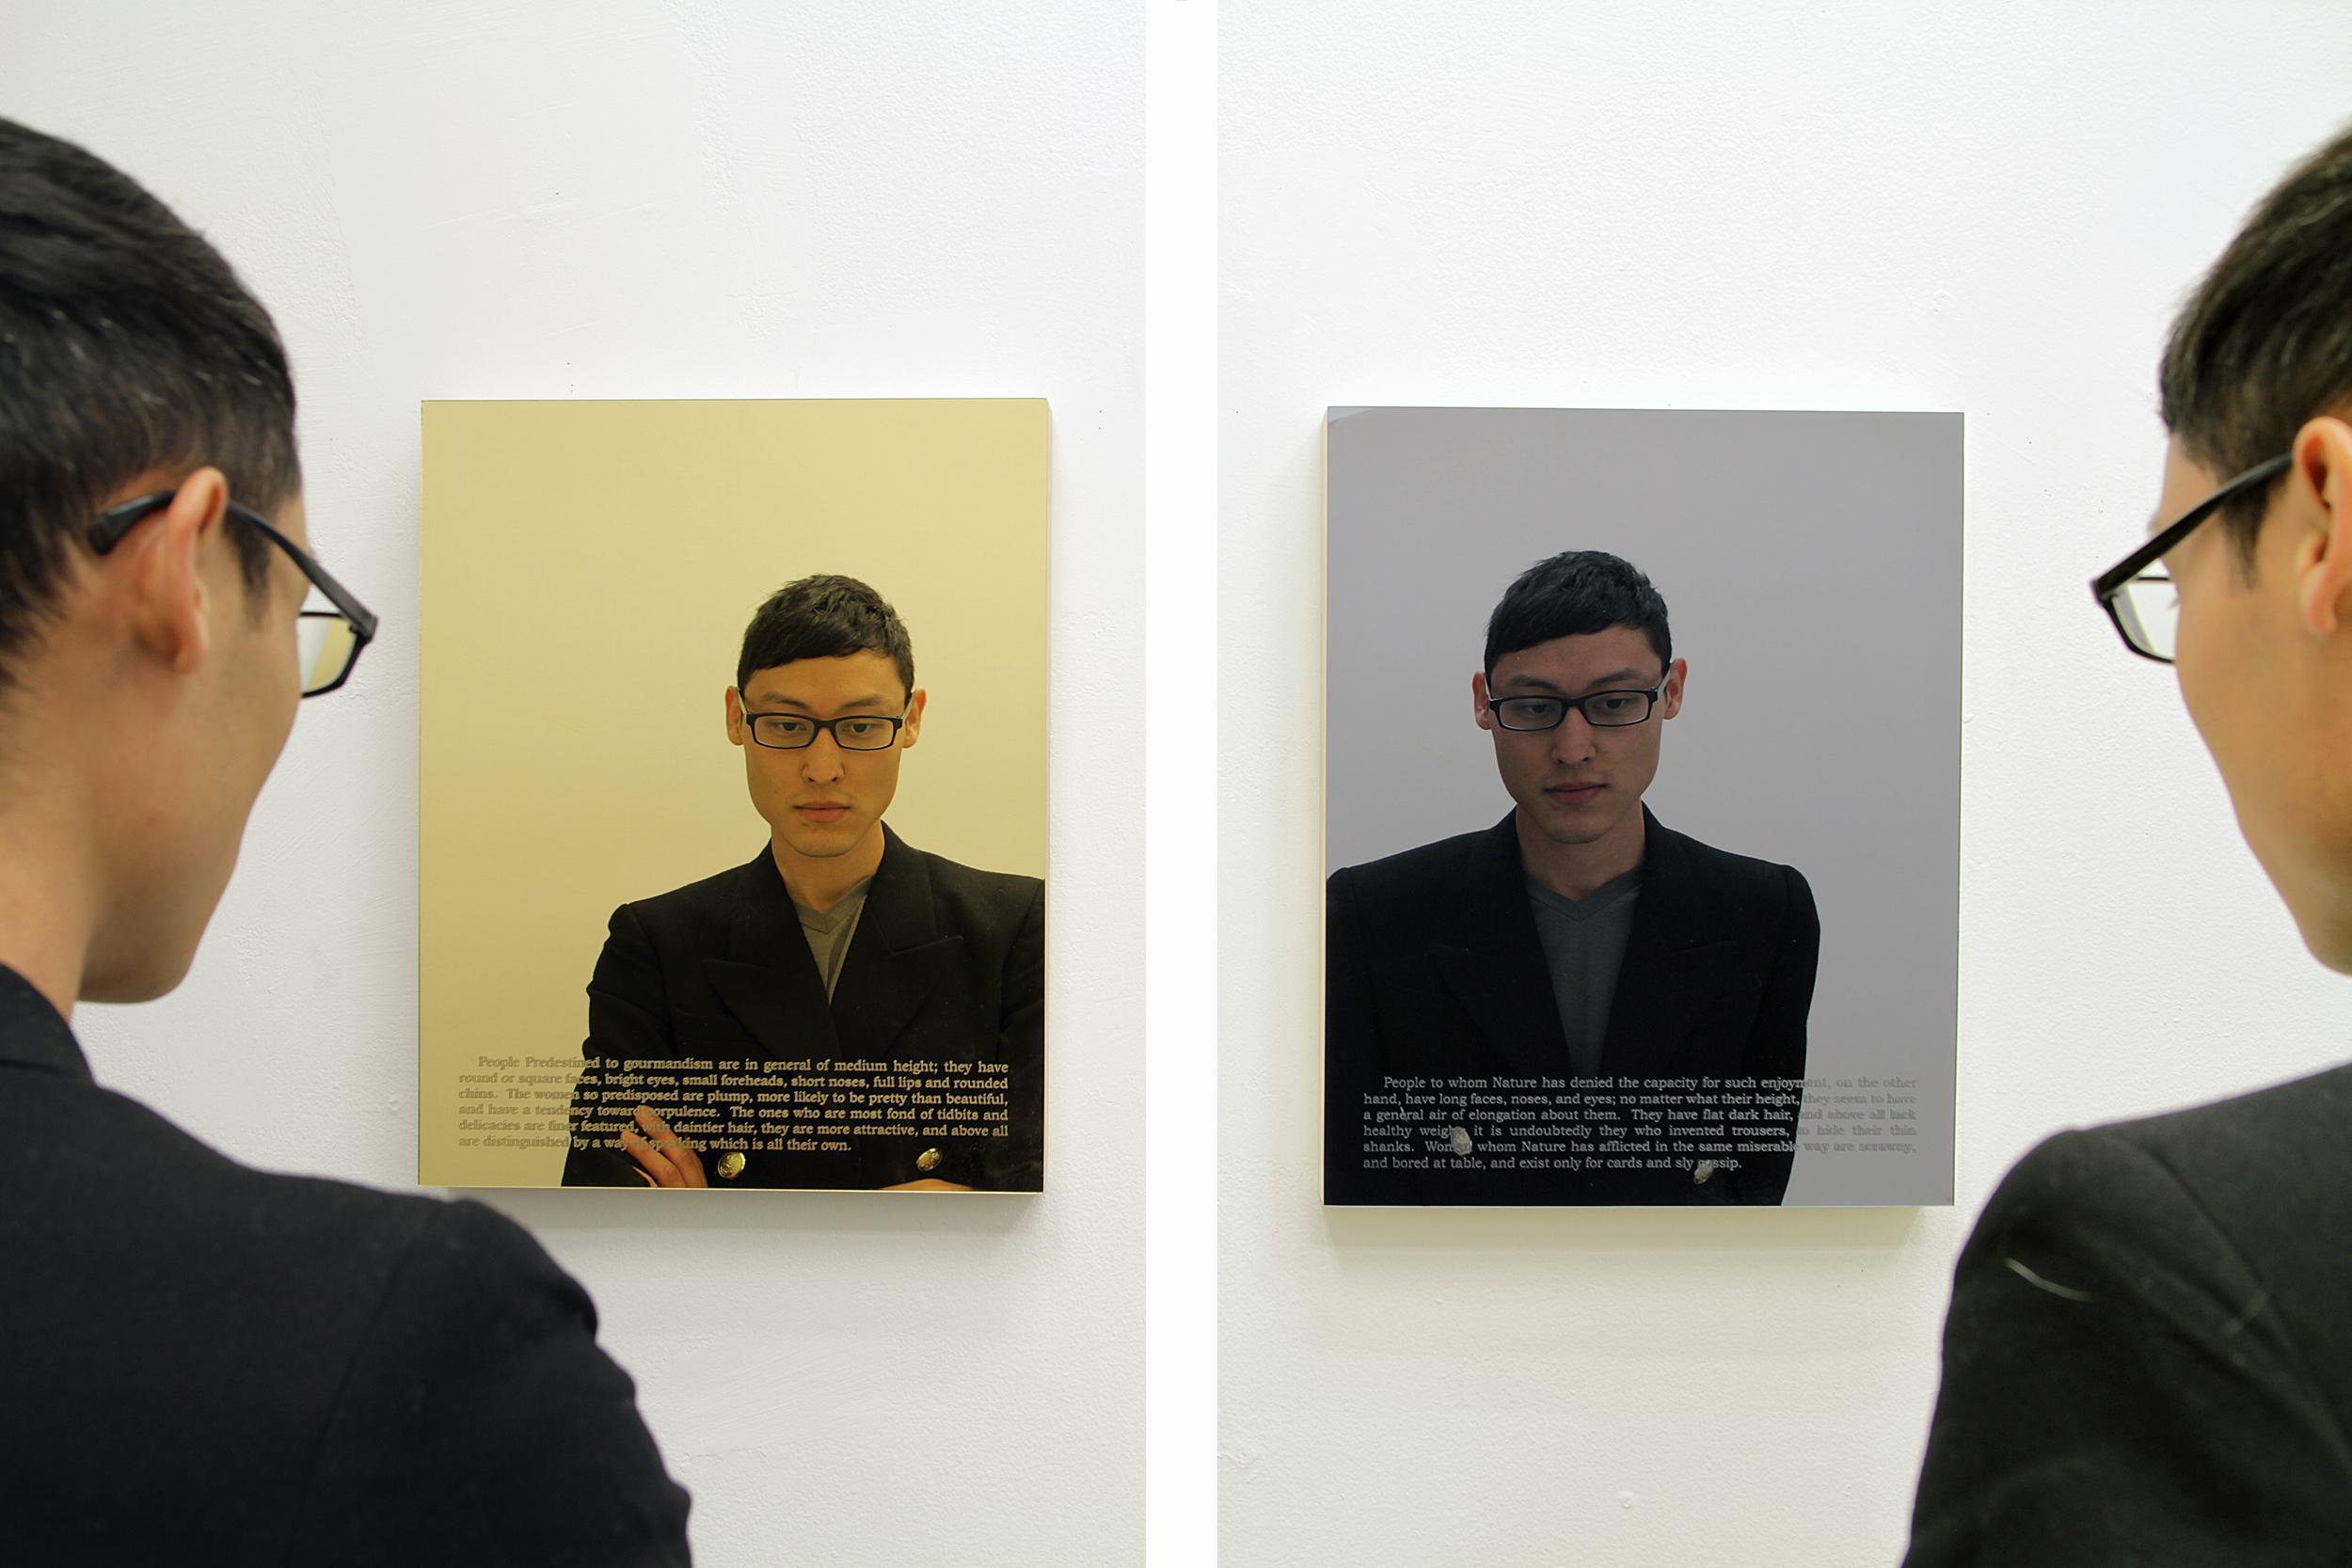 Sensual Predestination (for Jean Anthelme Brillat-Savarin)  (participation view) 2011 Laser-engraved mirrored plexiglass, wood 16X20 inches